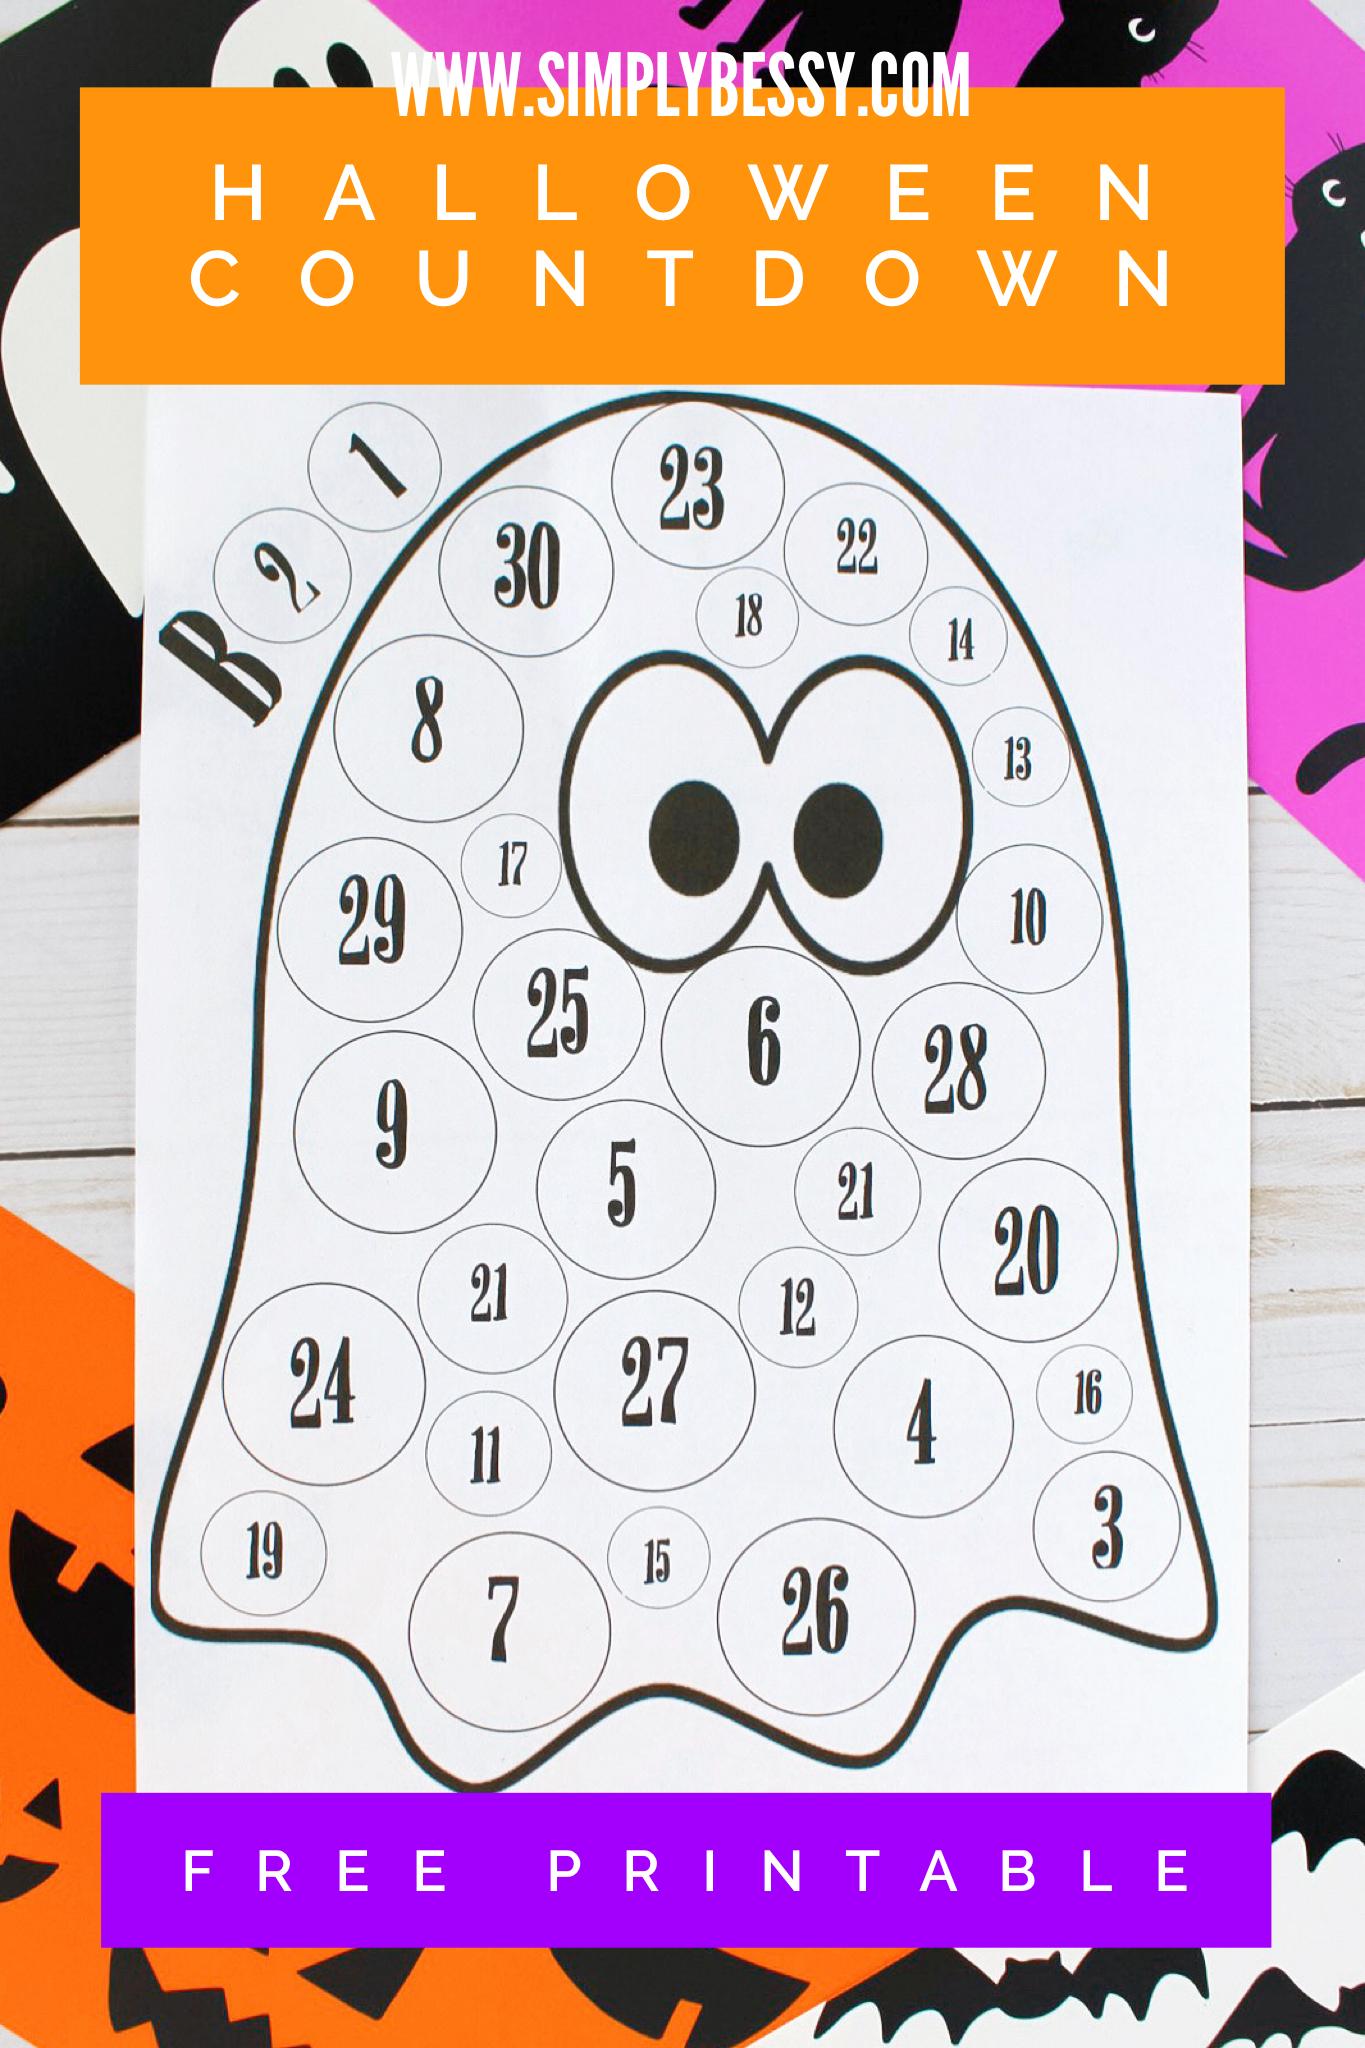 Free Printable Halloween Countdown